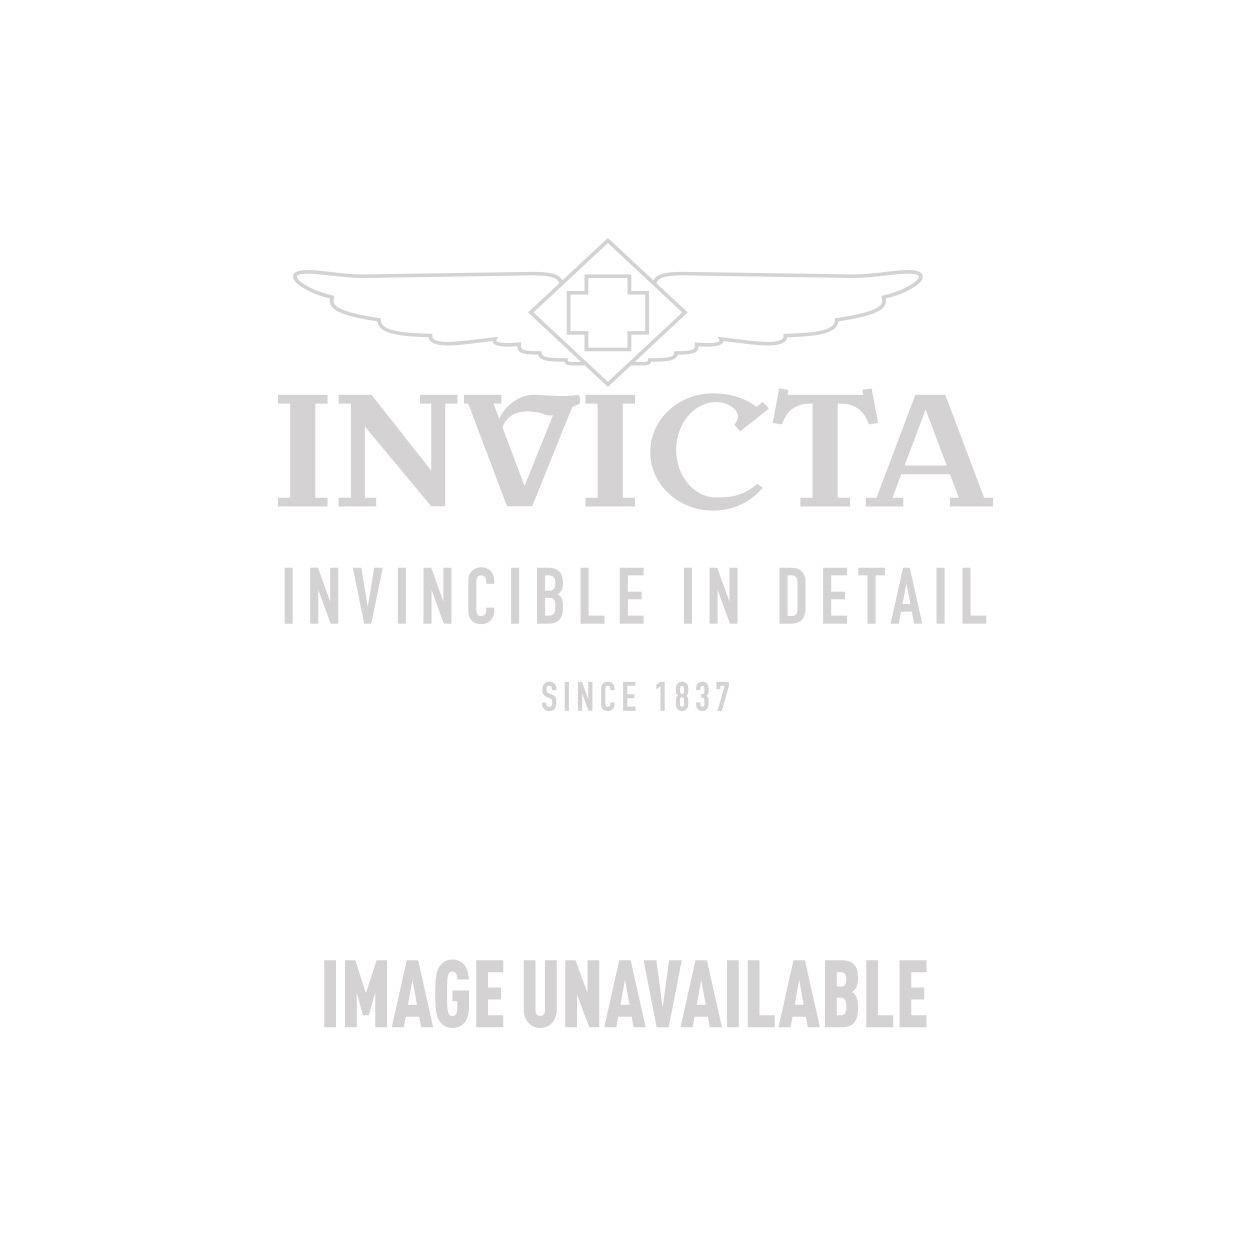 shop technomarine cruise monogram watches at invictastores com